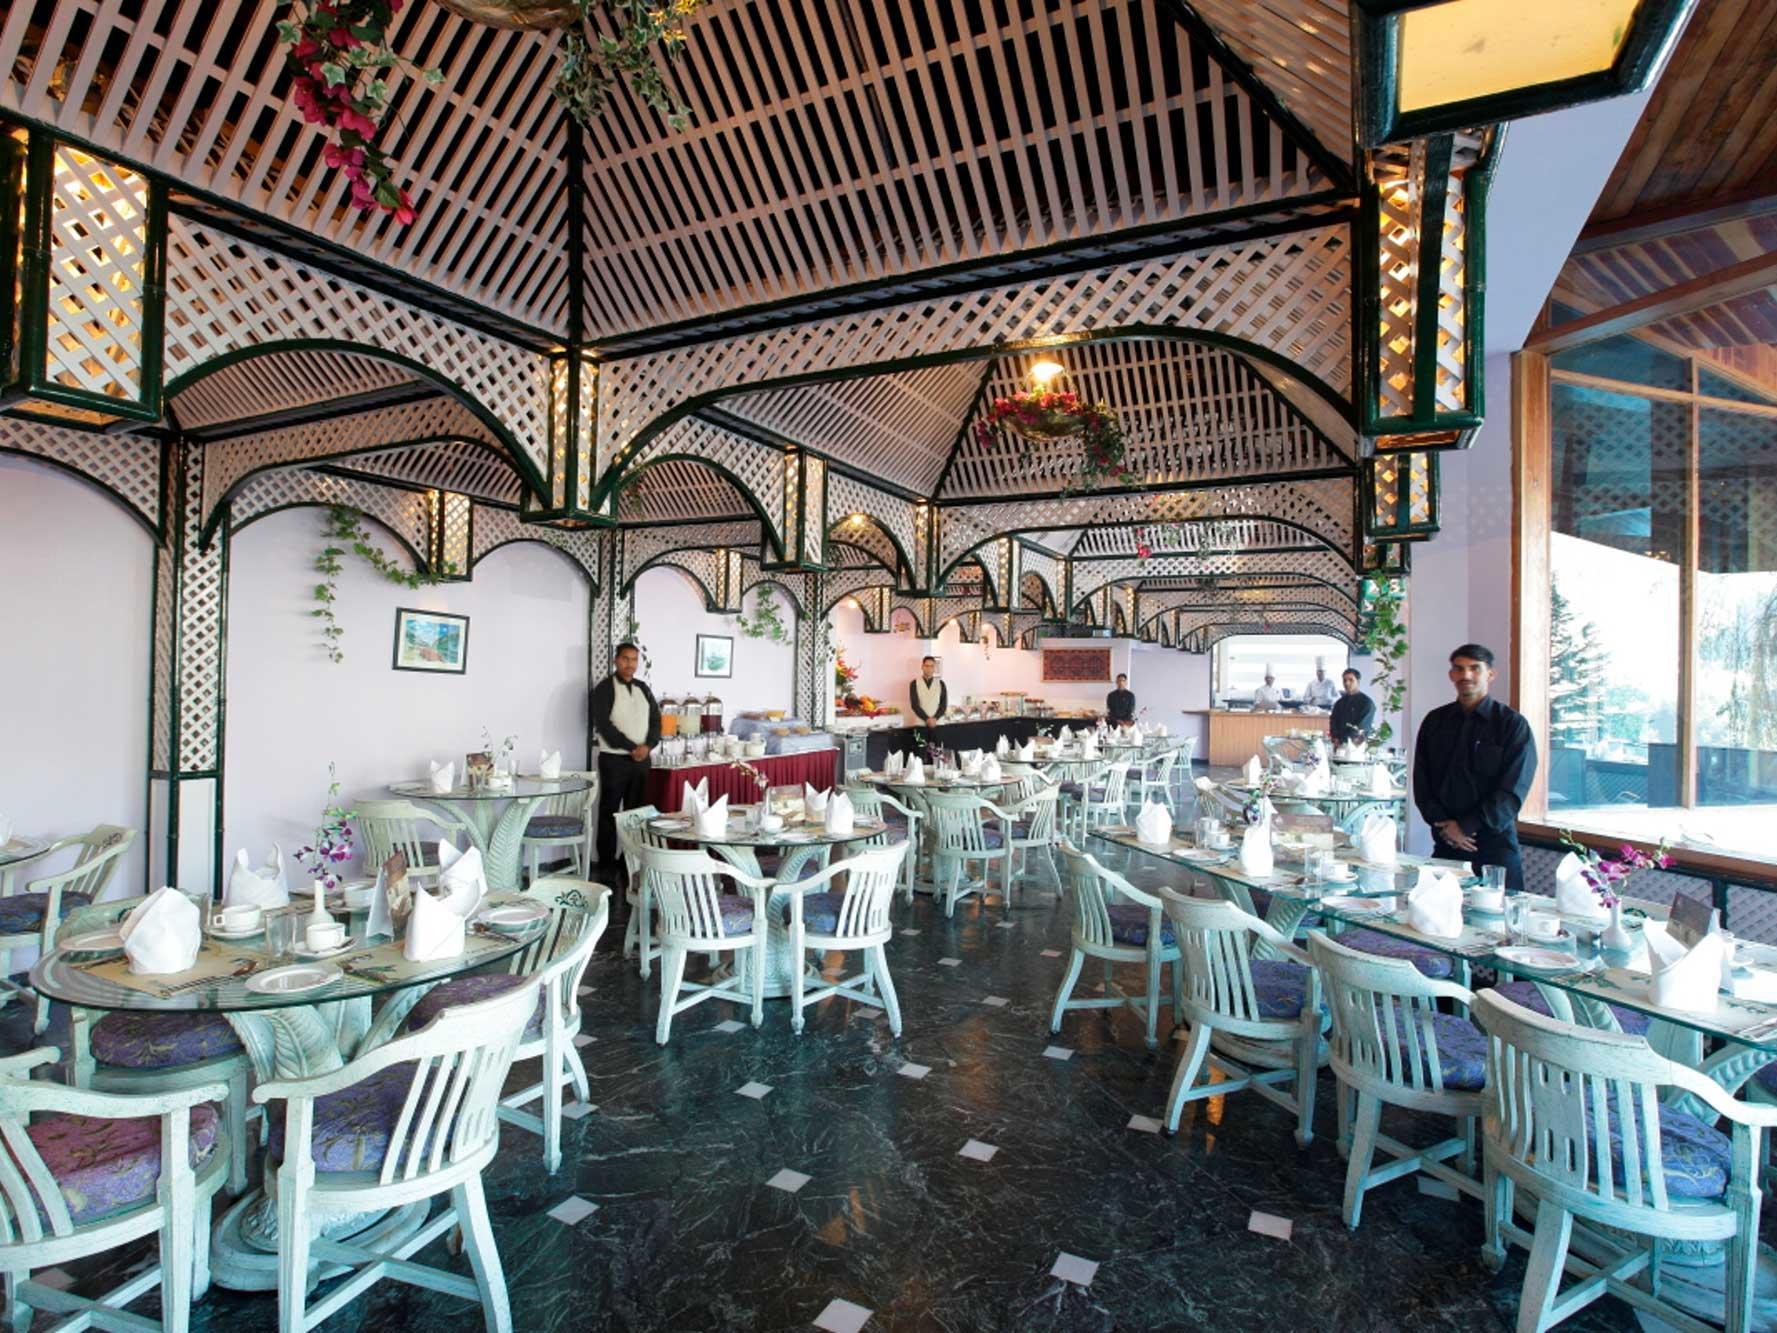 Cafe Jardin at ManuAllaya Resort Spa Manali in Himachal Pradesh, India